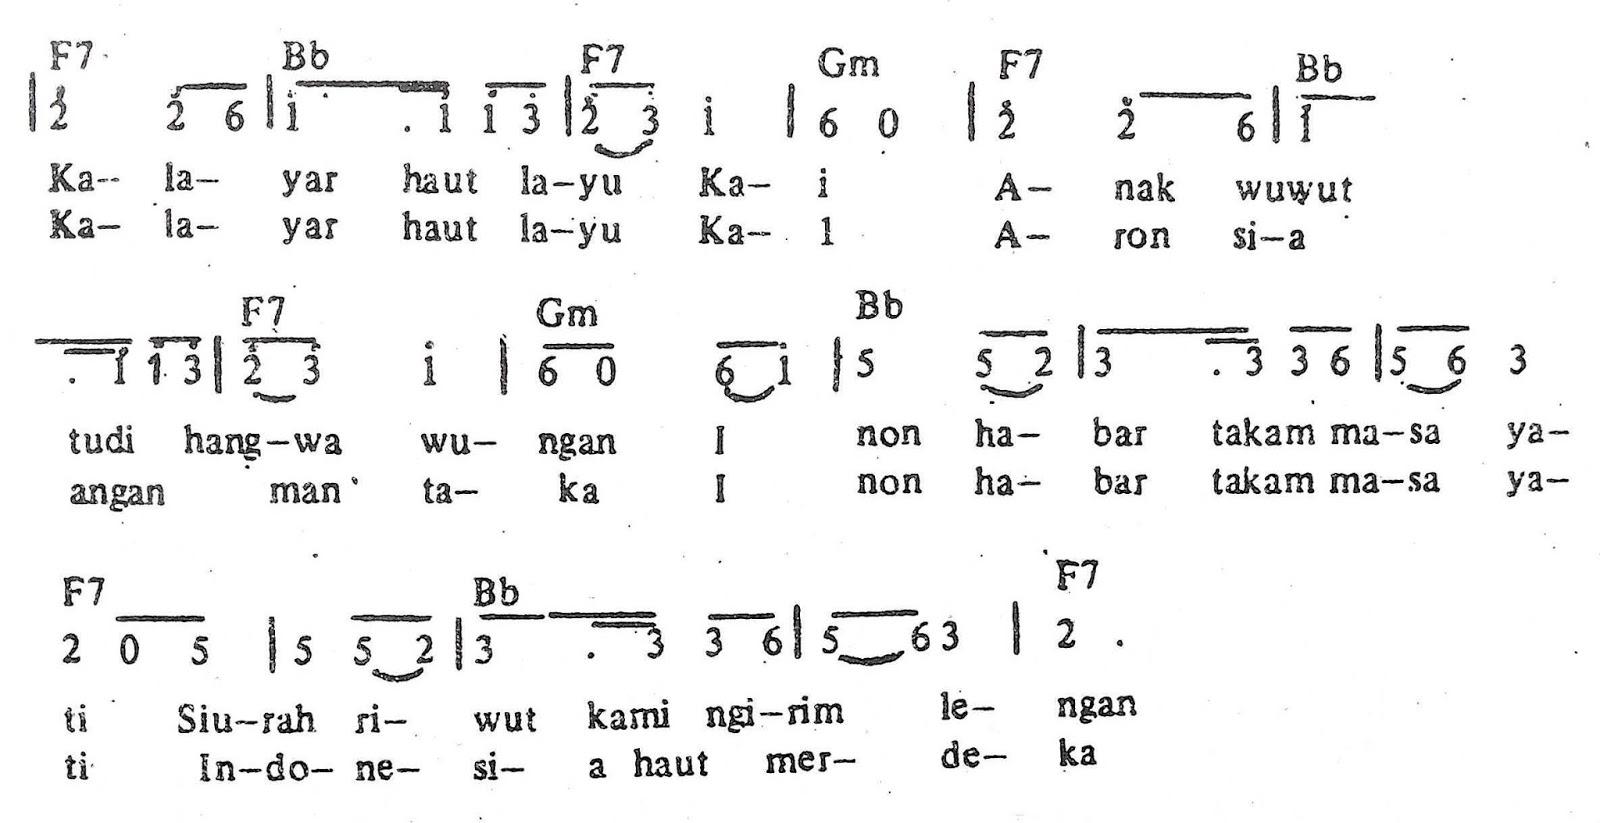 Chord & Arti Lirik Lagu Kalimantan Tengah: Kalayar + Not Angka